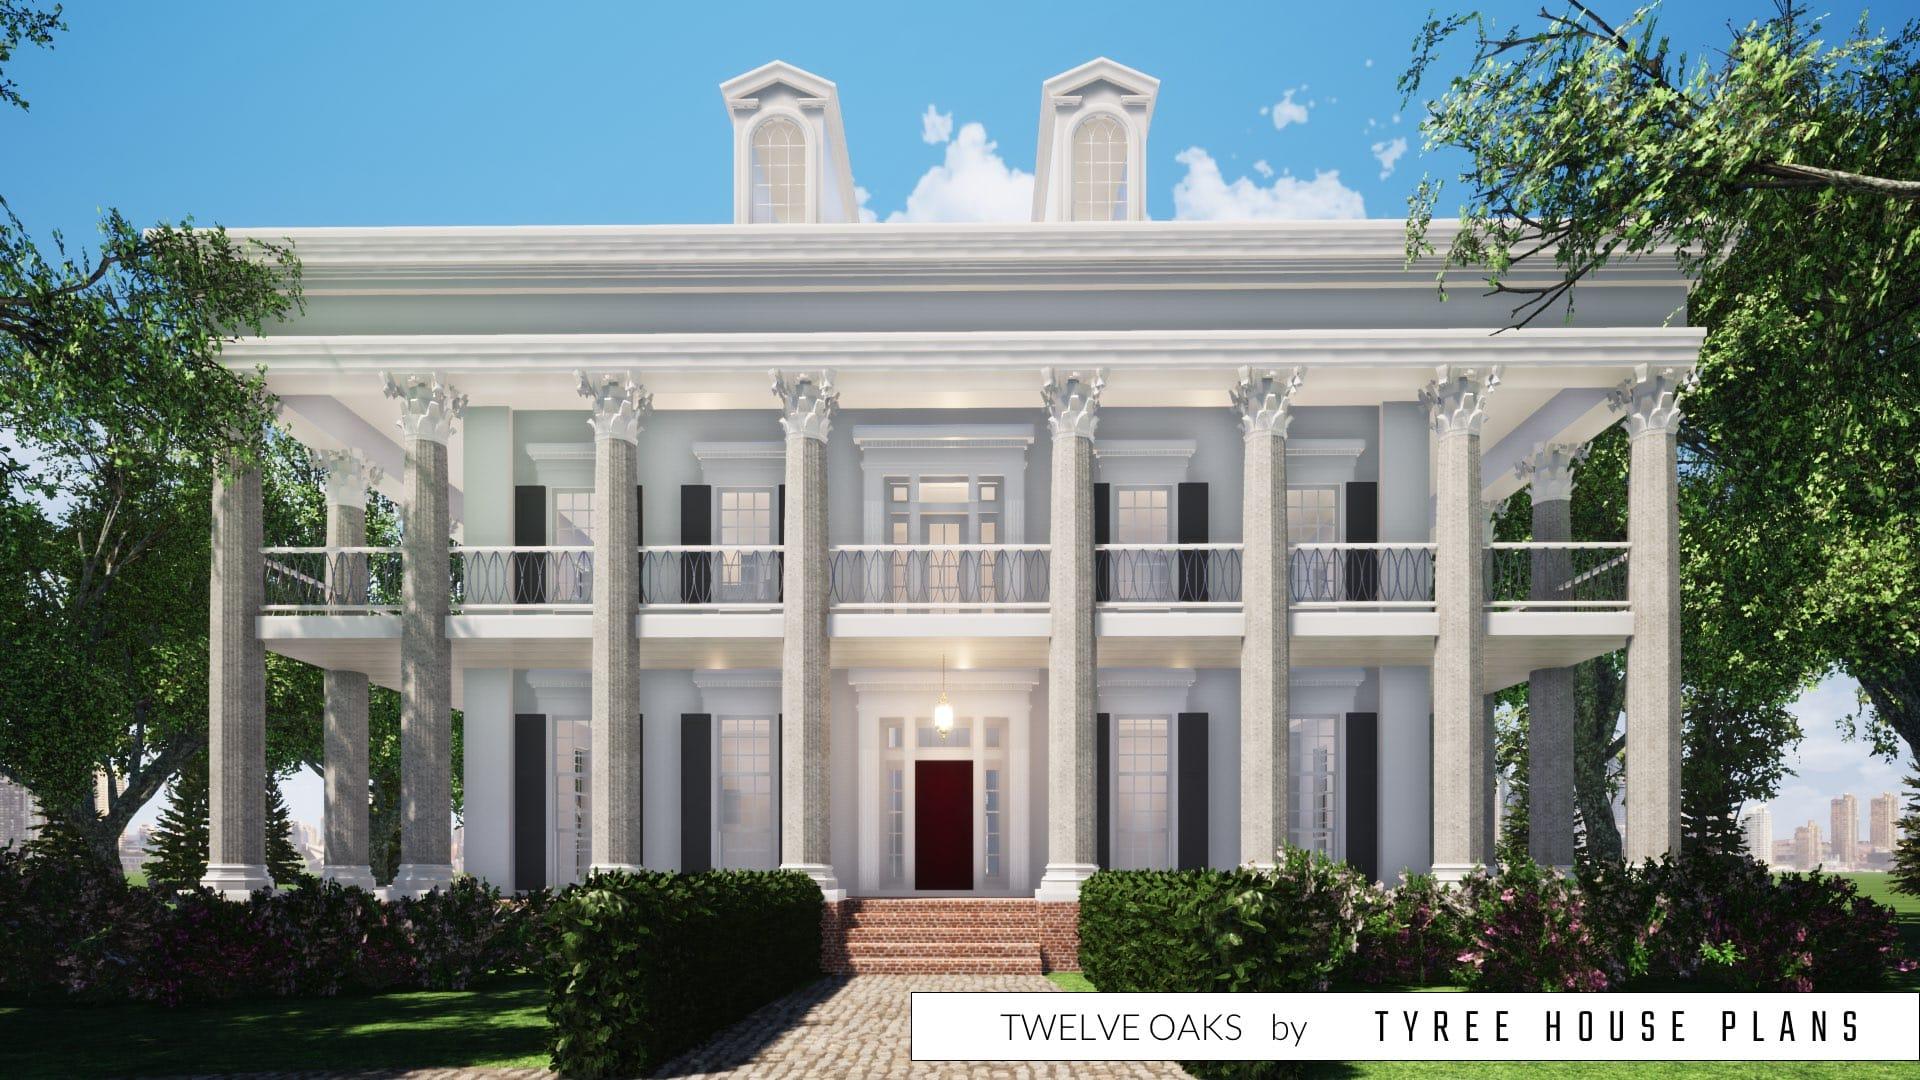 Twelve Oaks House Plan by Tyree House Plans